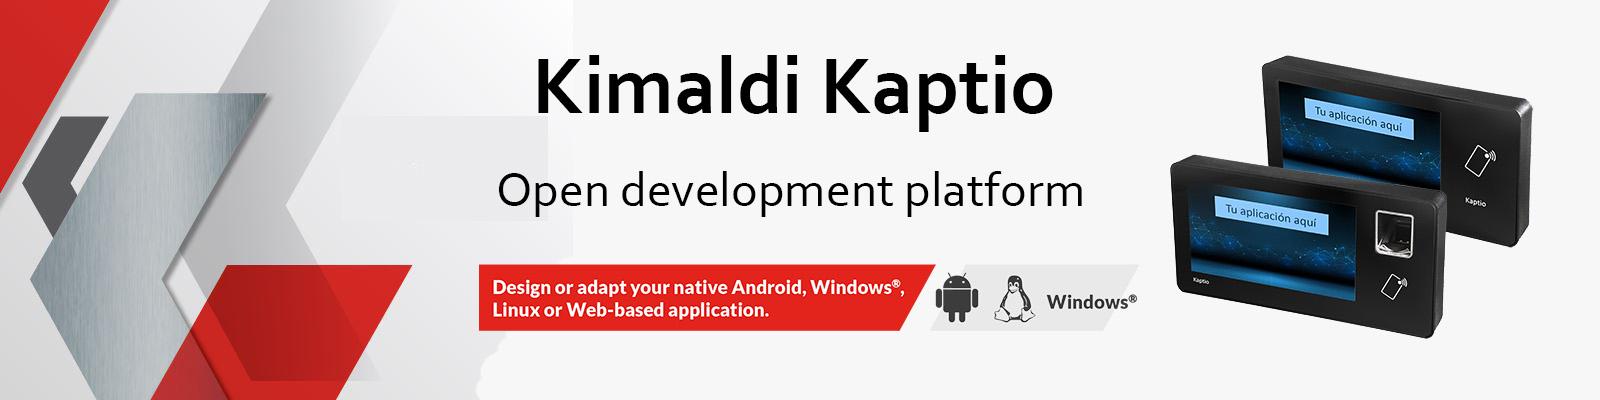 Kimaldi Kaptio - Open development platform